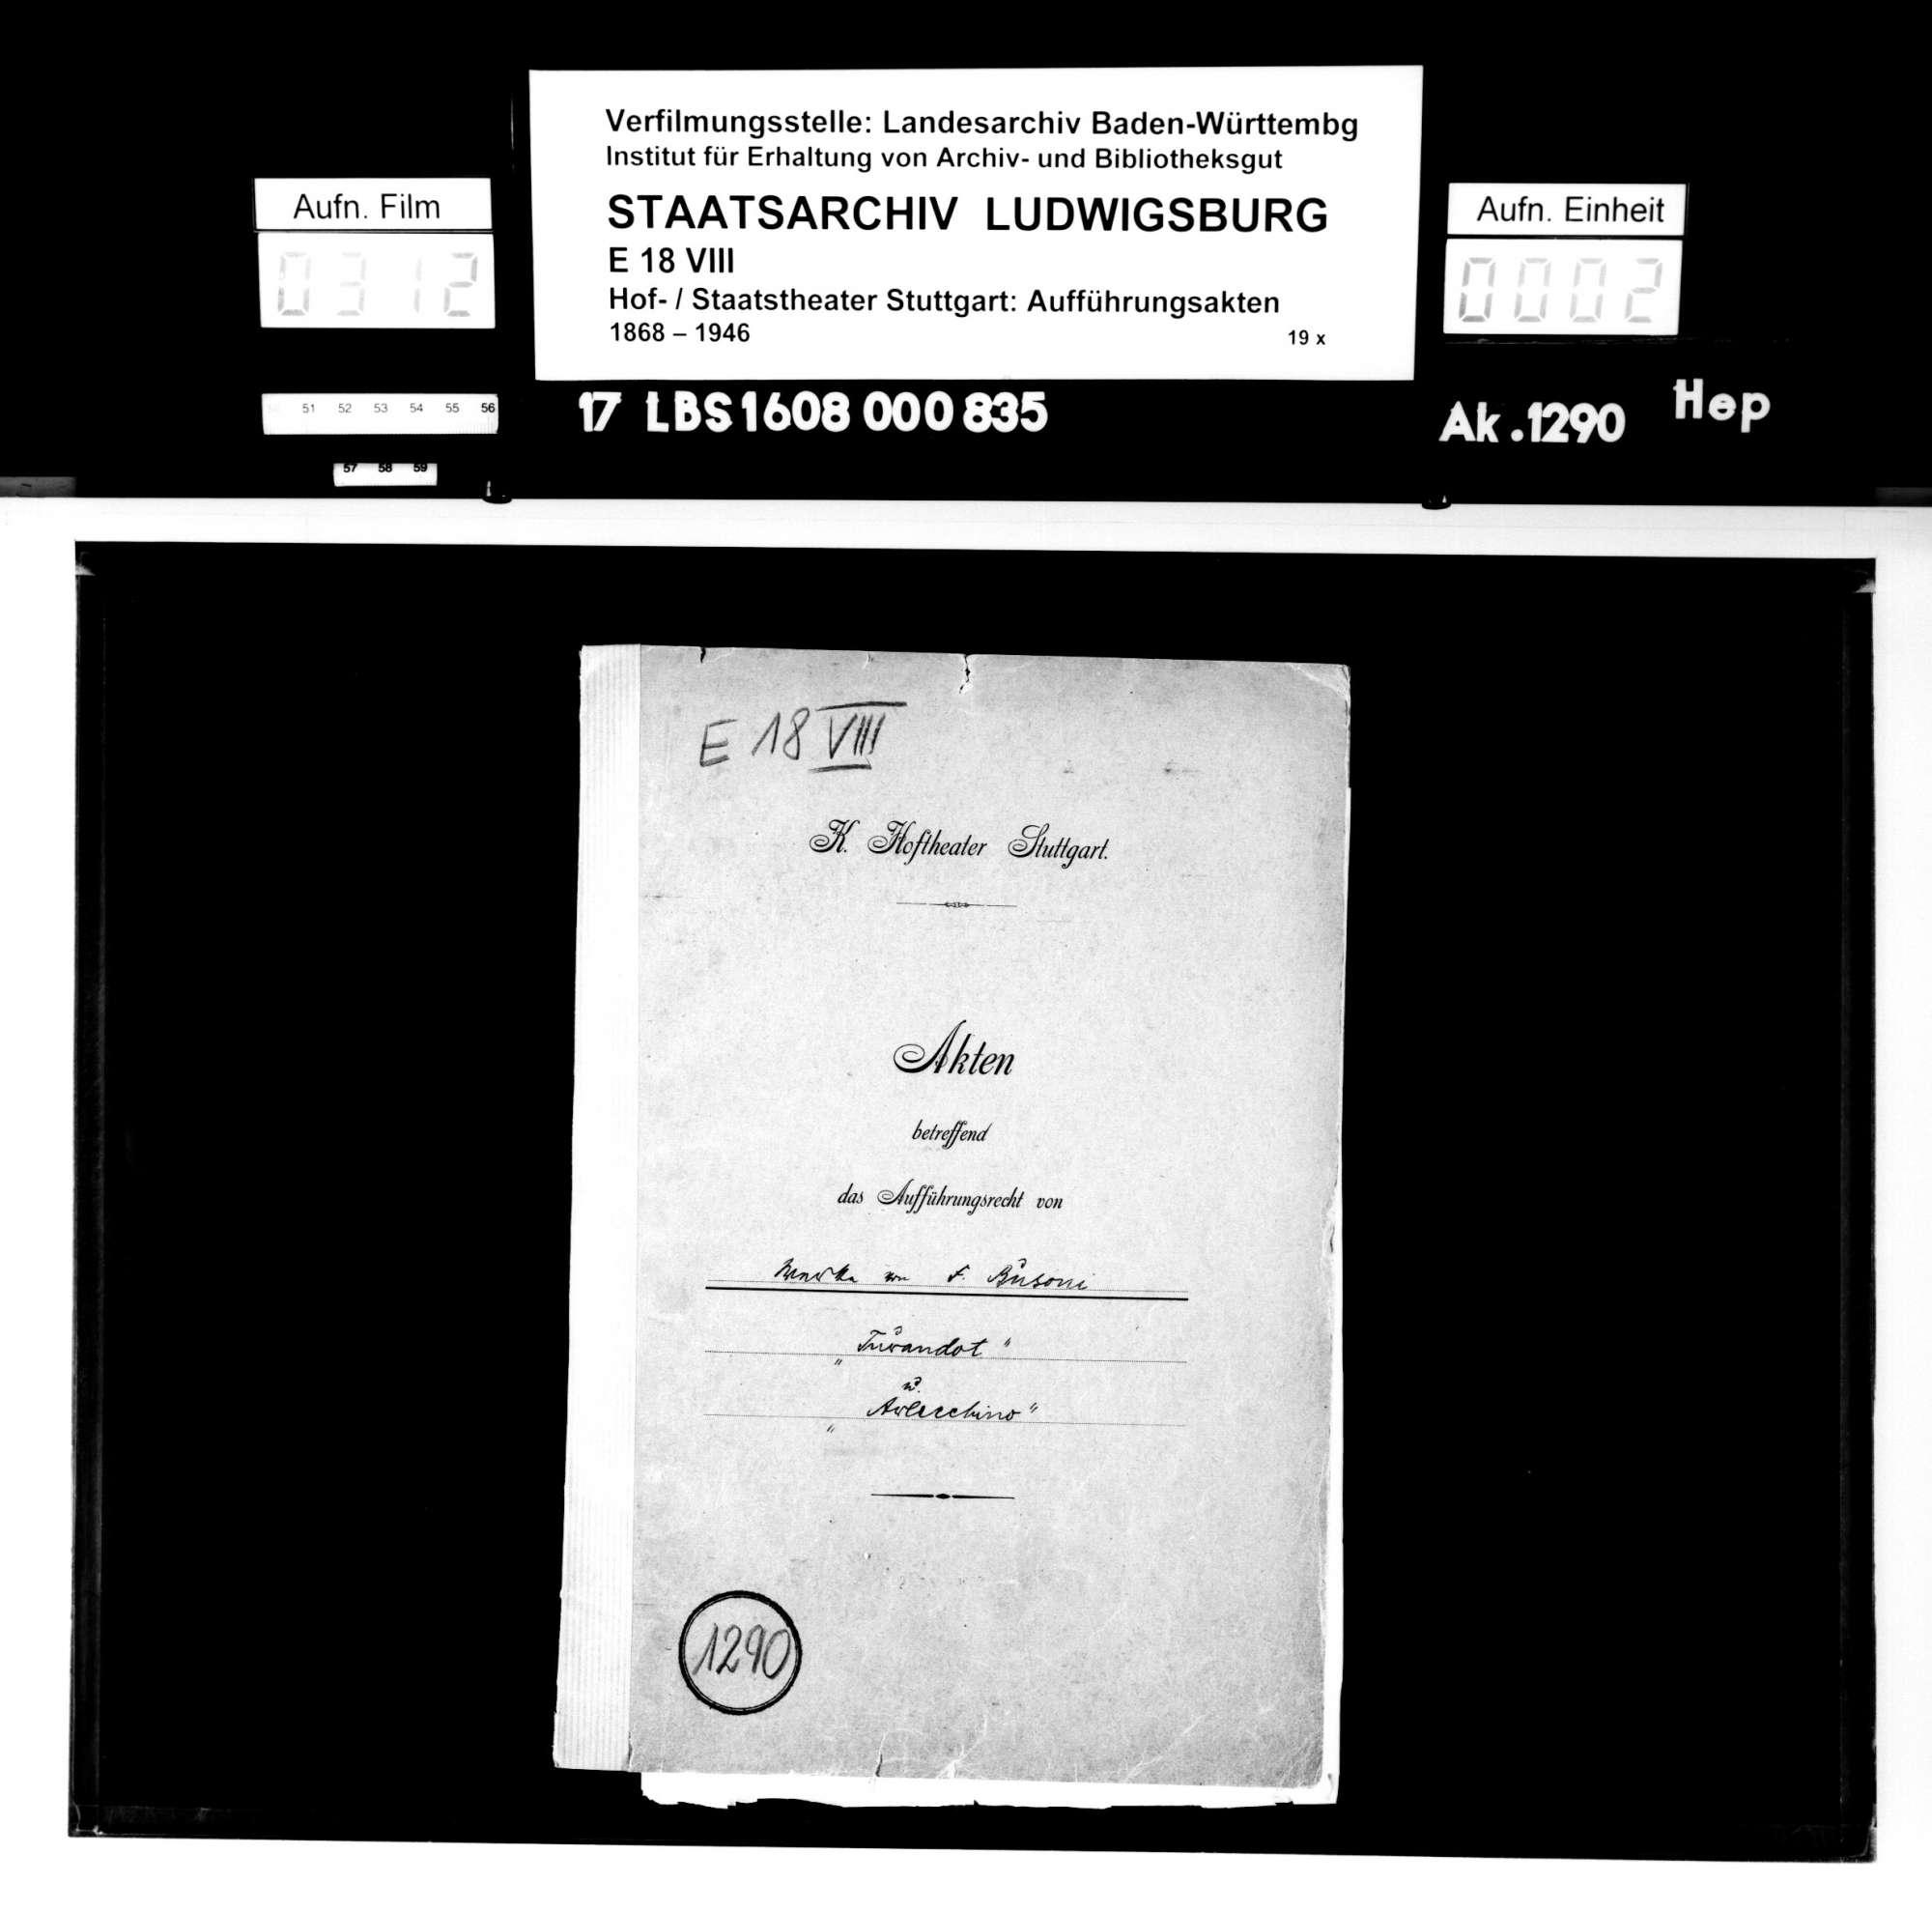 Turandot. Oper von Ferrucio Busoni; Text: Karl Vollmöller, Bild 1